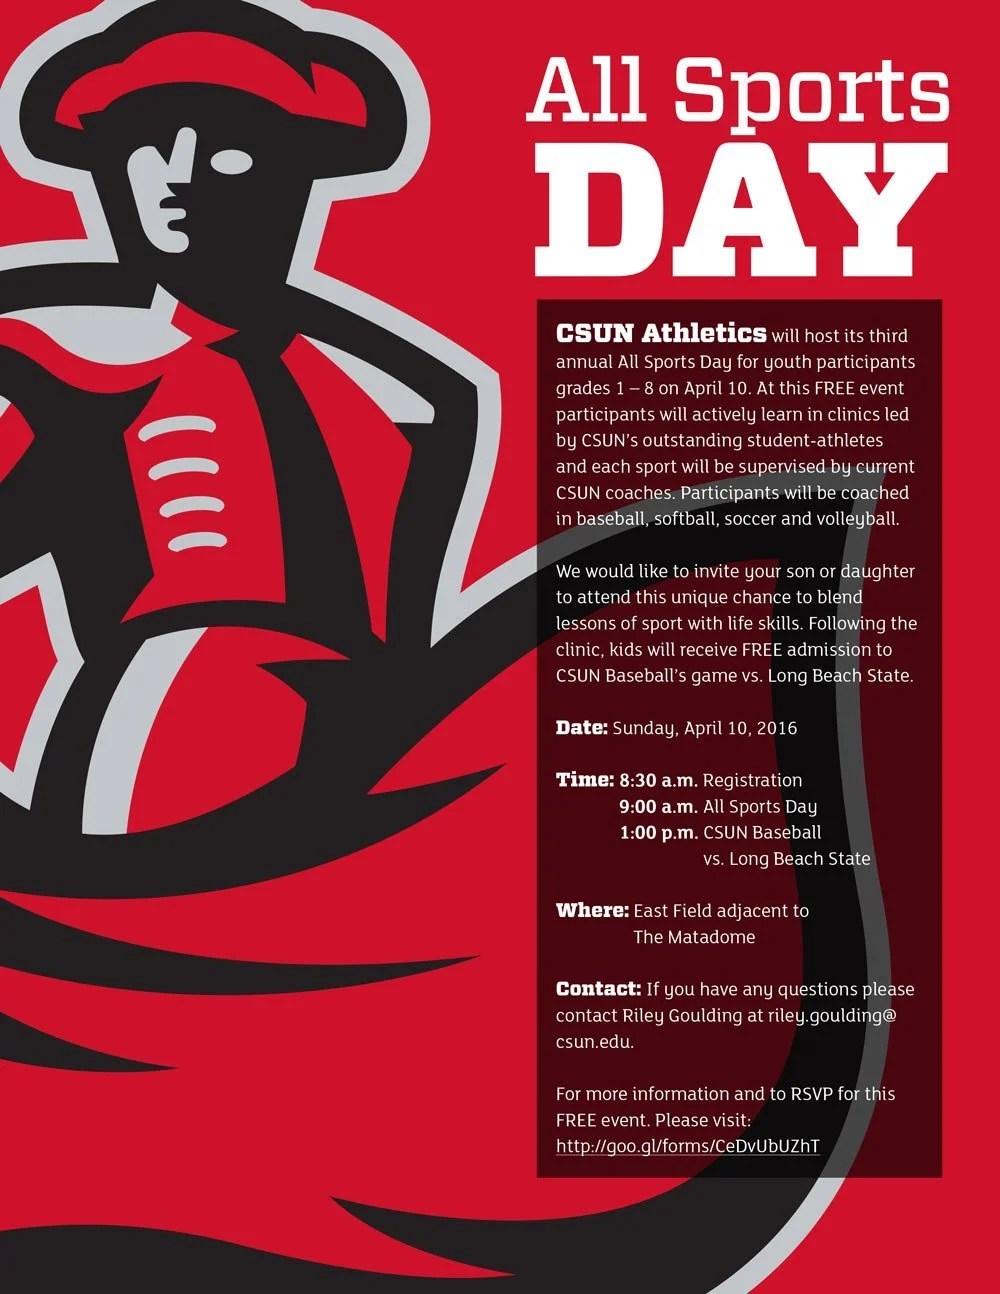 CSUN All Sports Day Free Clinic